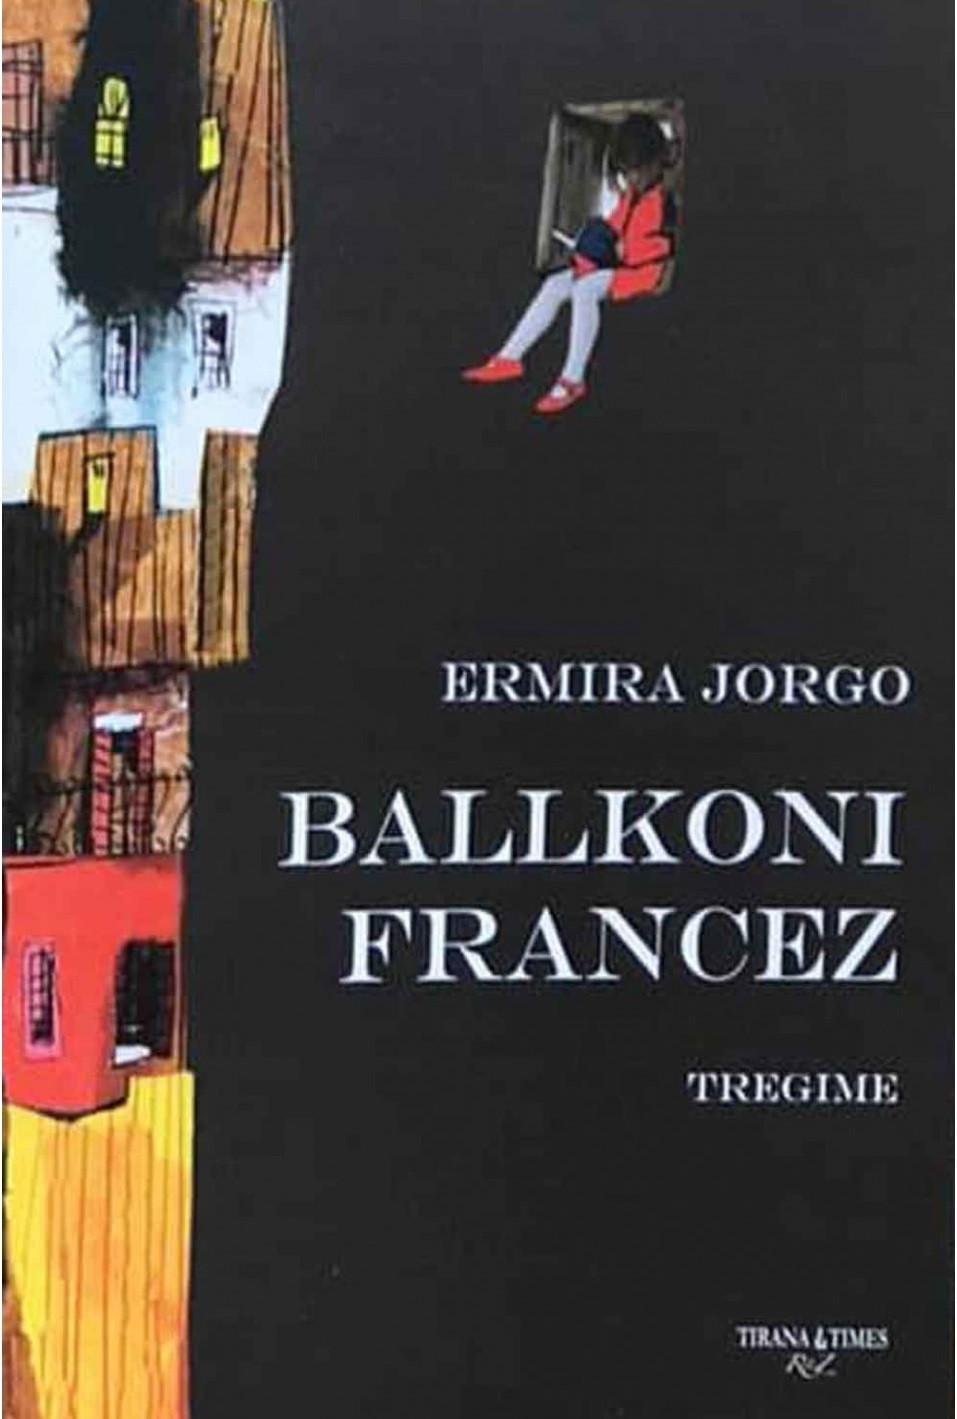 Ballkoni francez